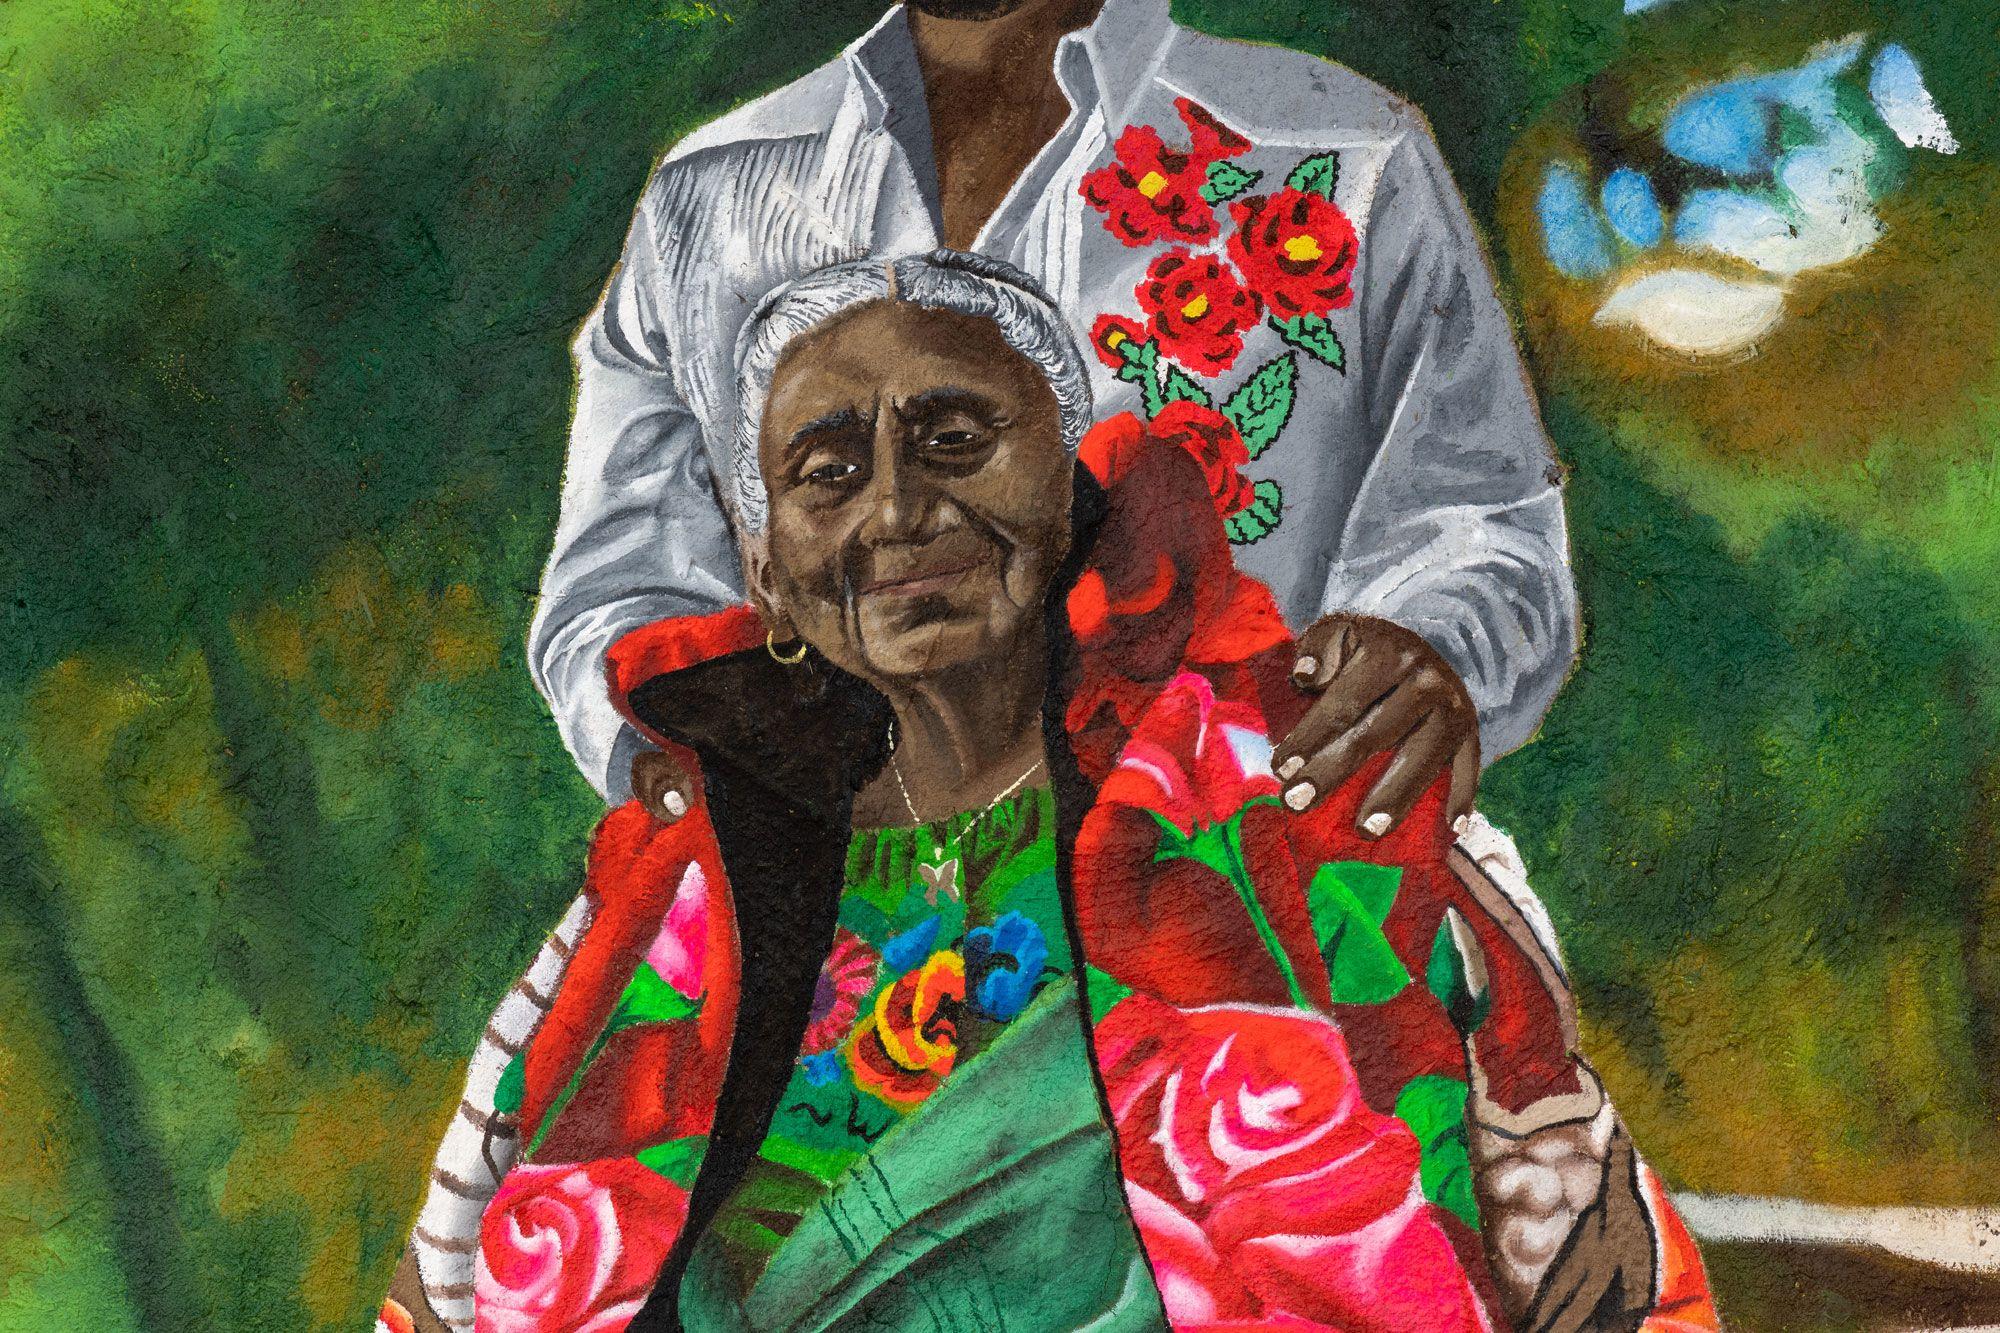 Yosi con Abuelita, detail